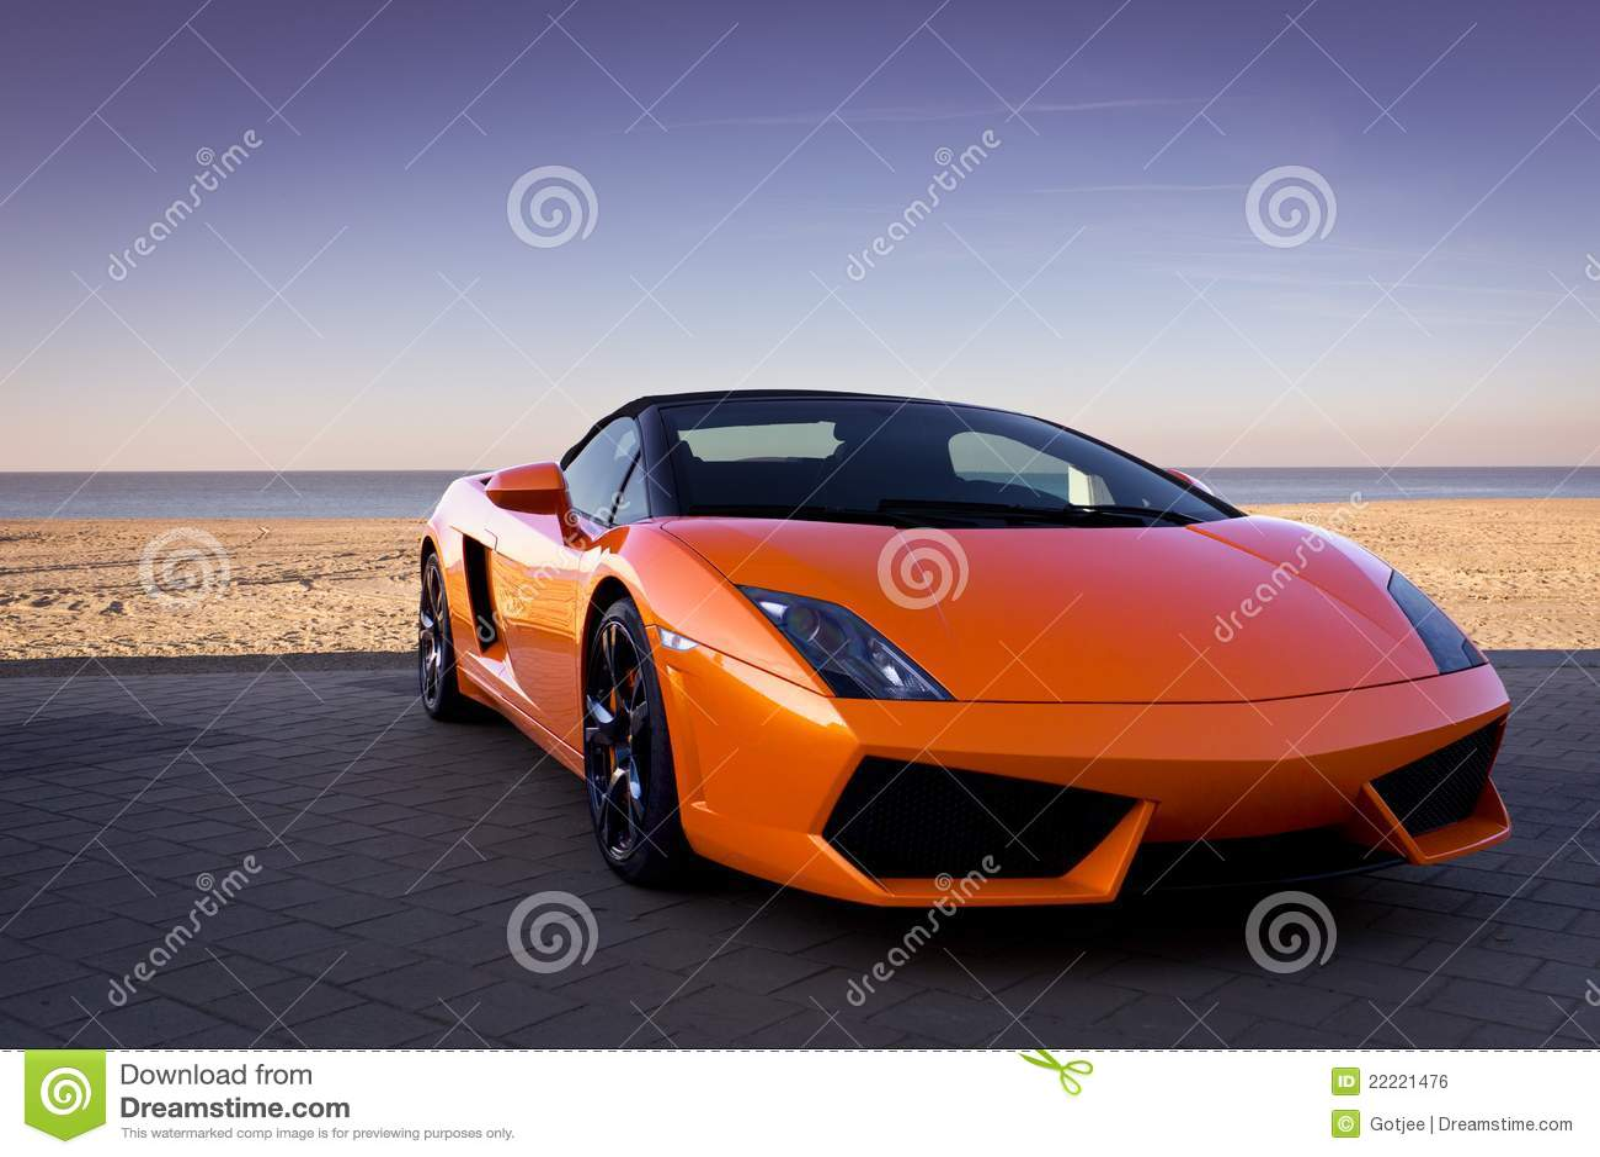 voiture de sport orange sexy luxueuse pr s de plage. Black Bedroom Furniture Sets. Home Design Ideas